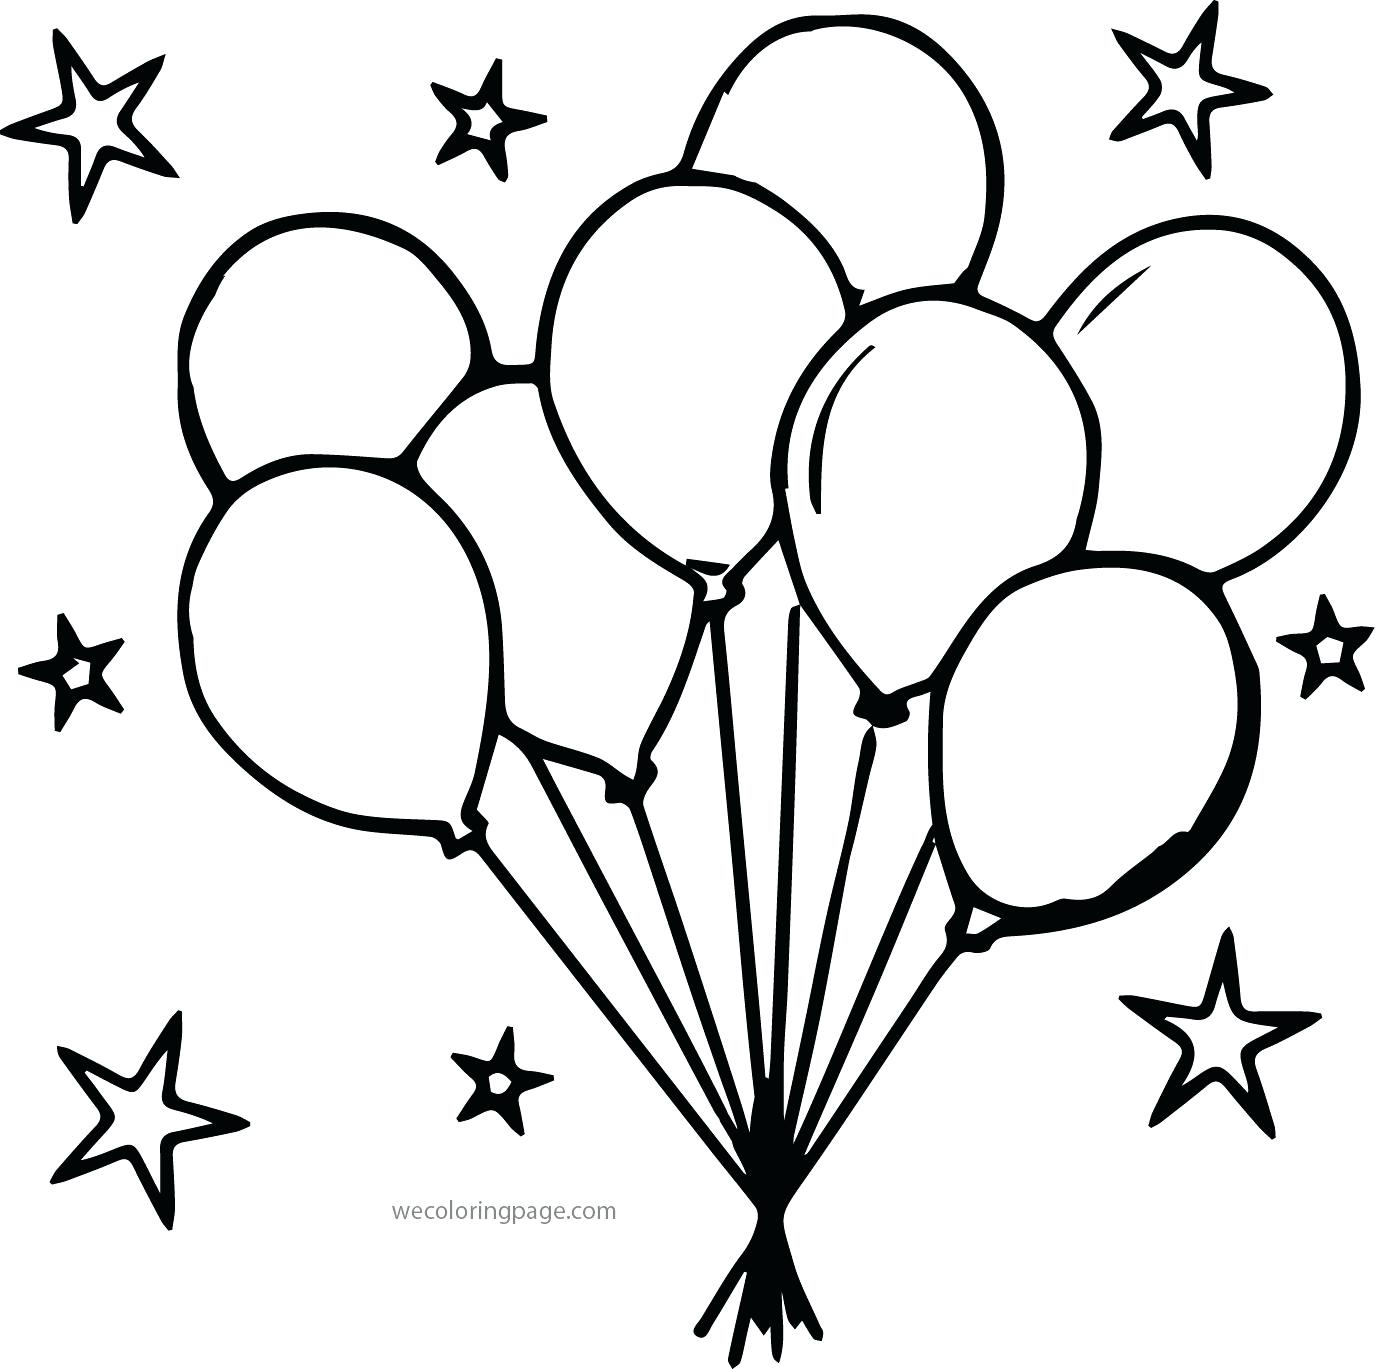 Party Balloons Drawing At Getdrawings